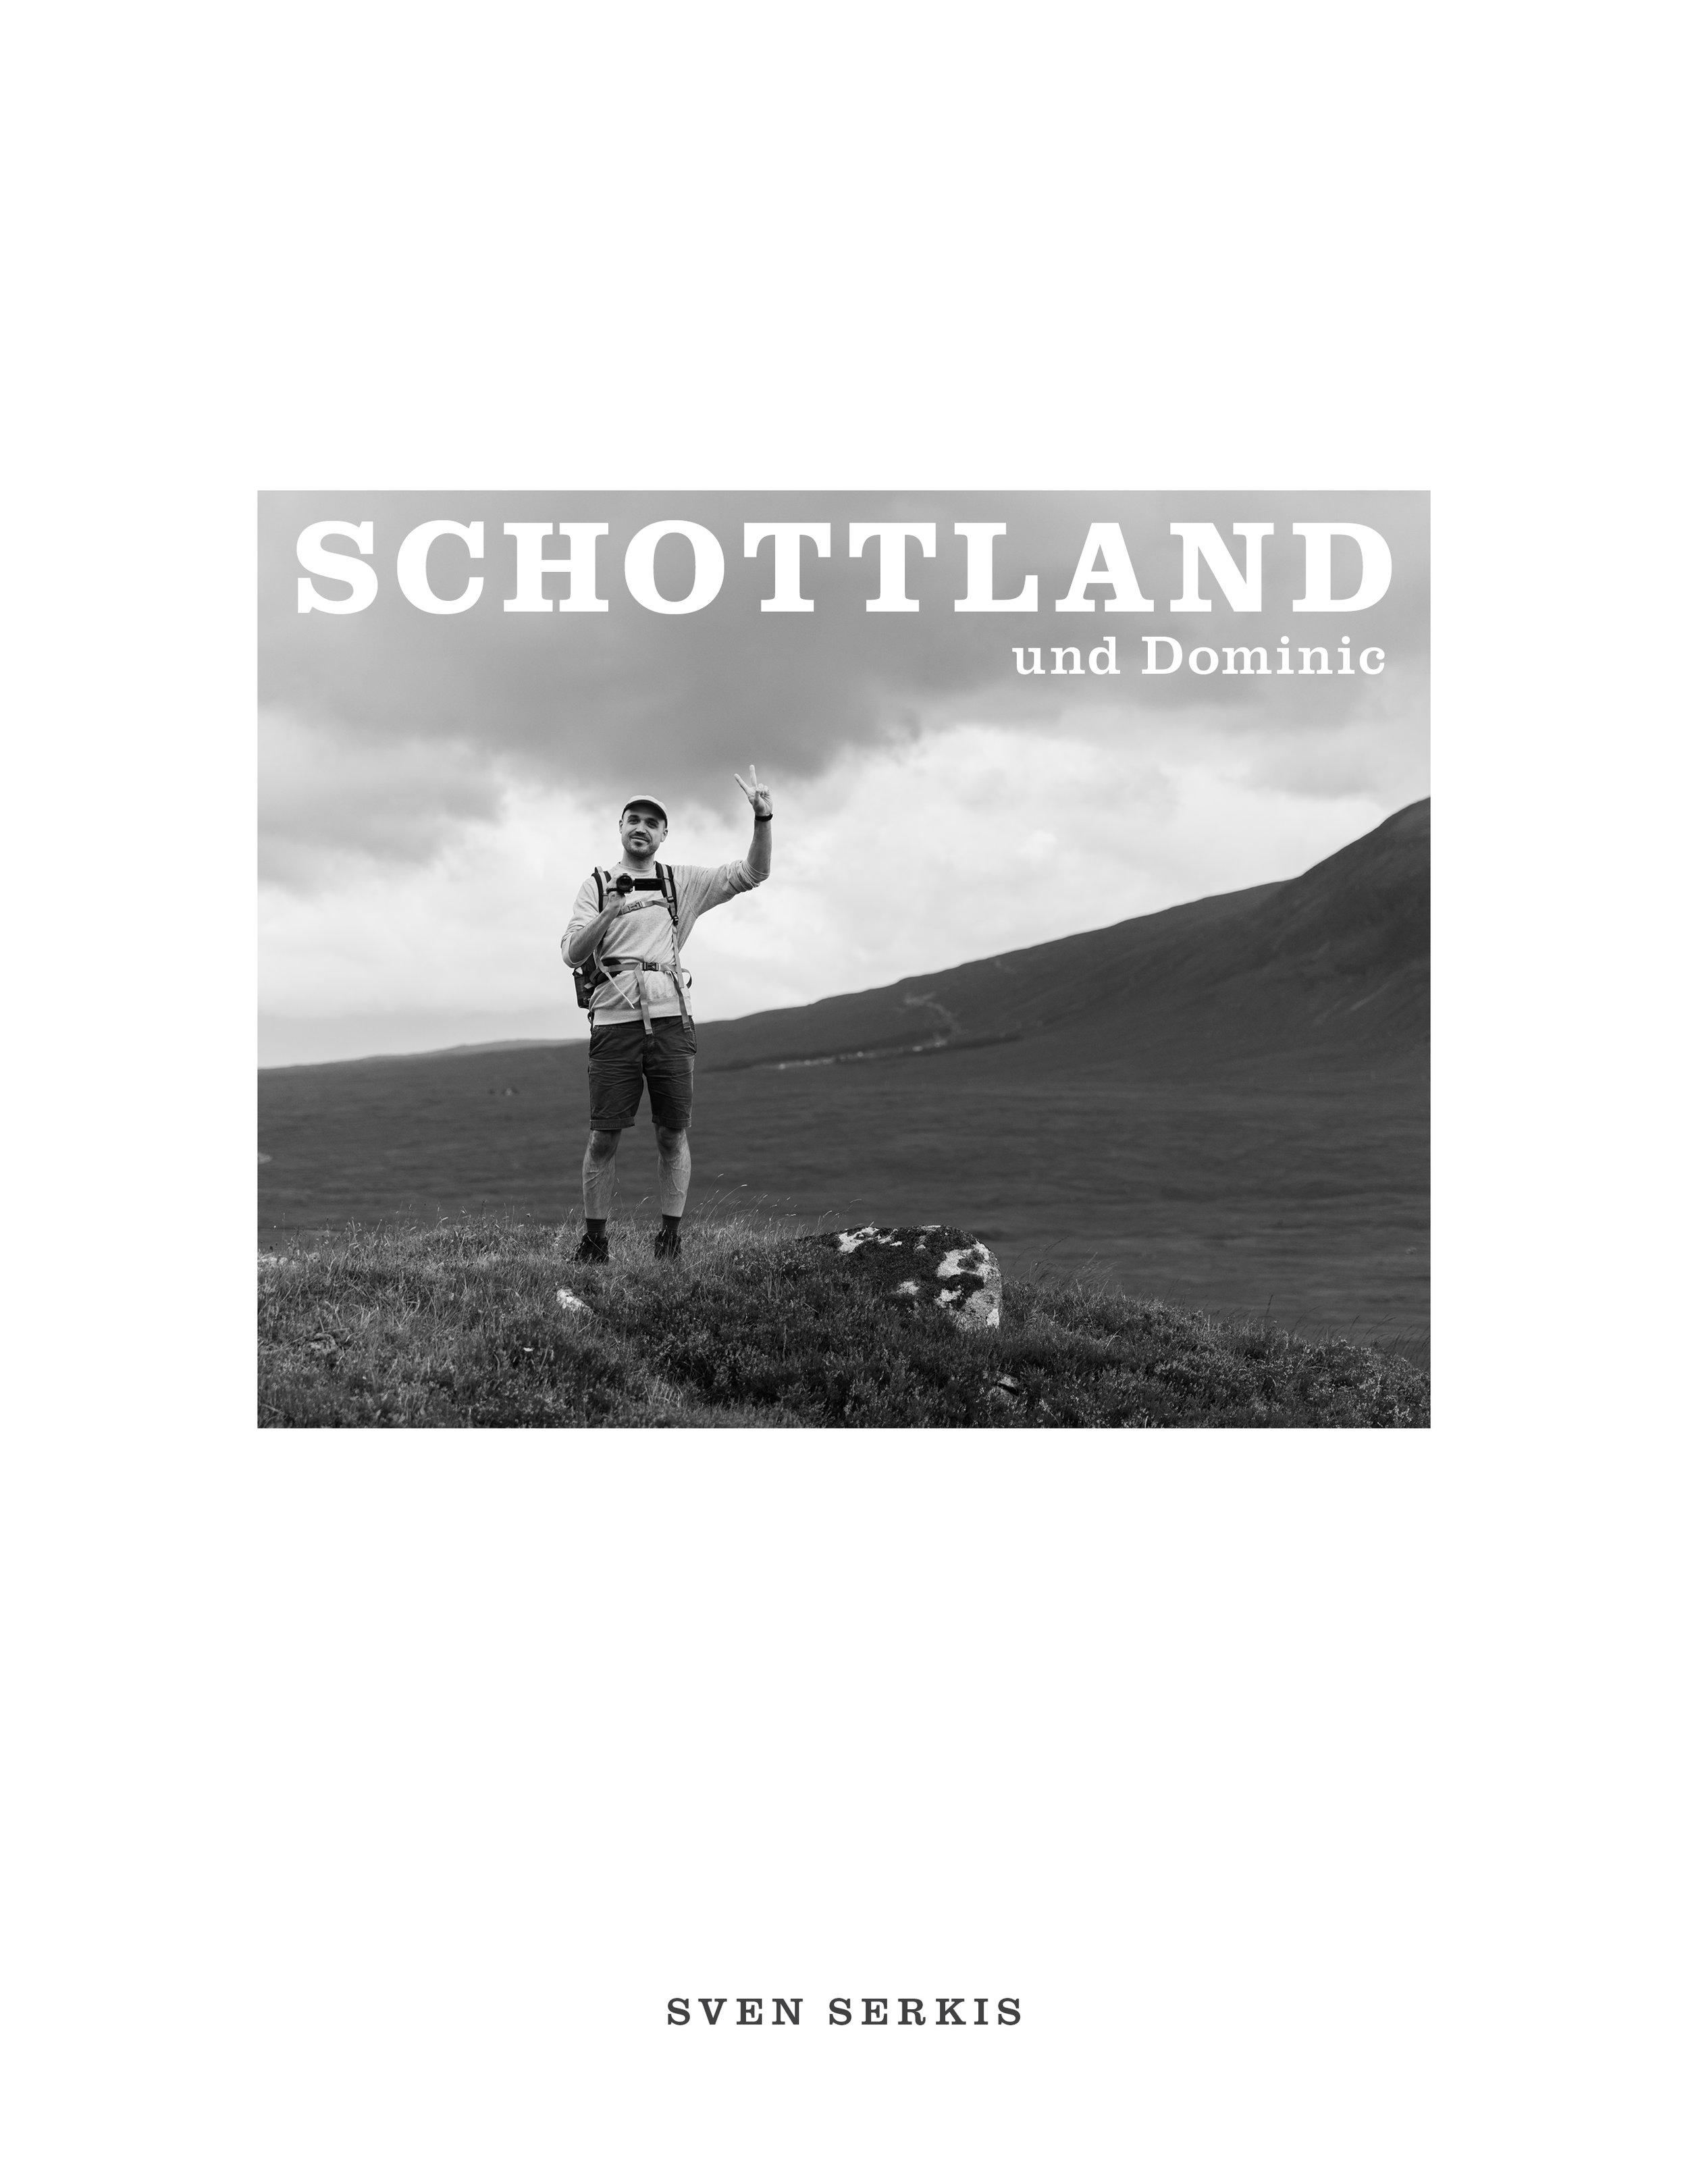 SERKIS_SCHOTTLAND_SMALL22.jpg